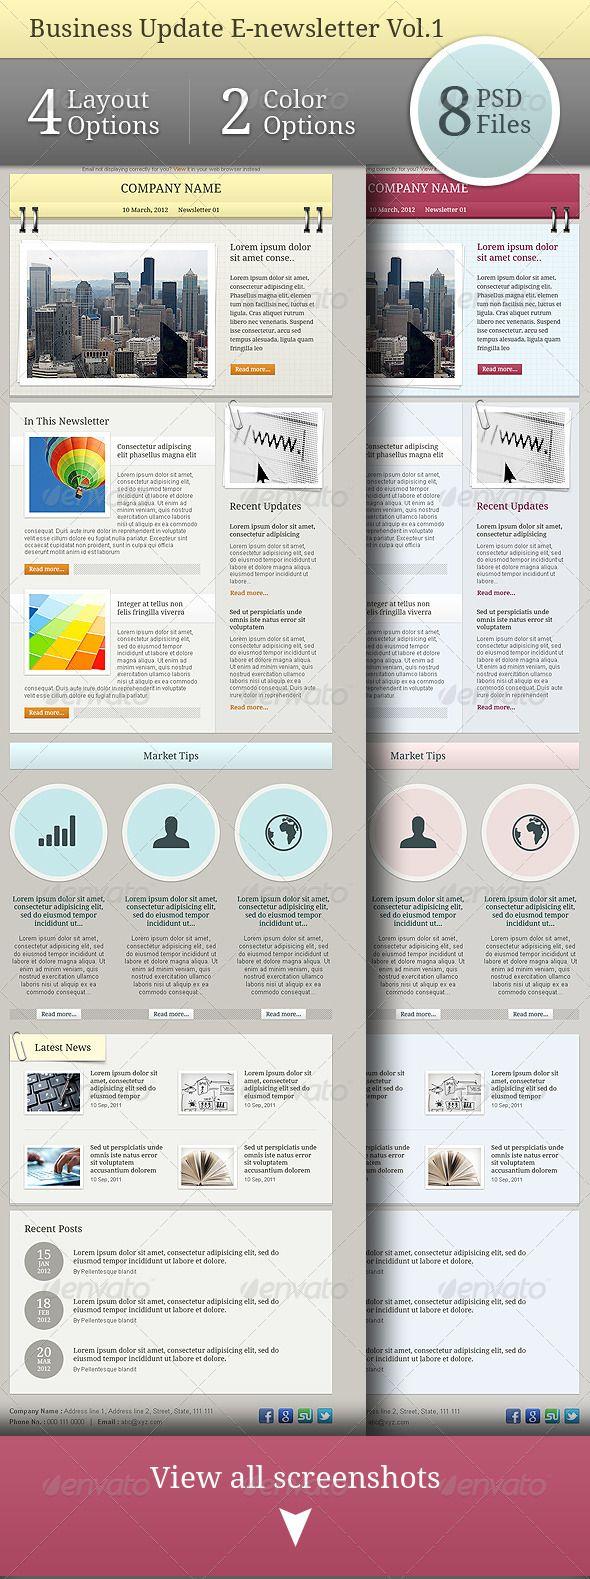 Business Update E-newsletter Vol.01 | Email template design ...